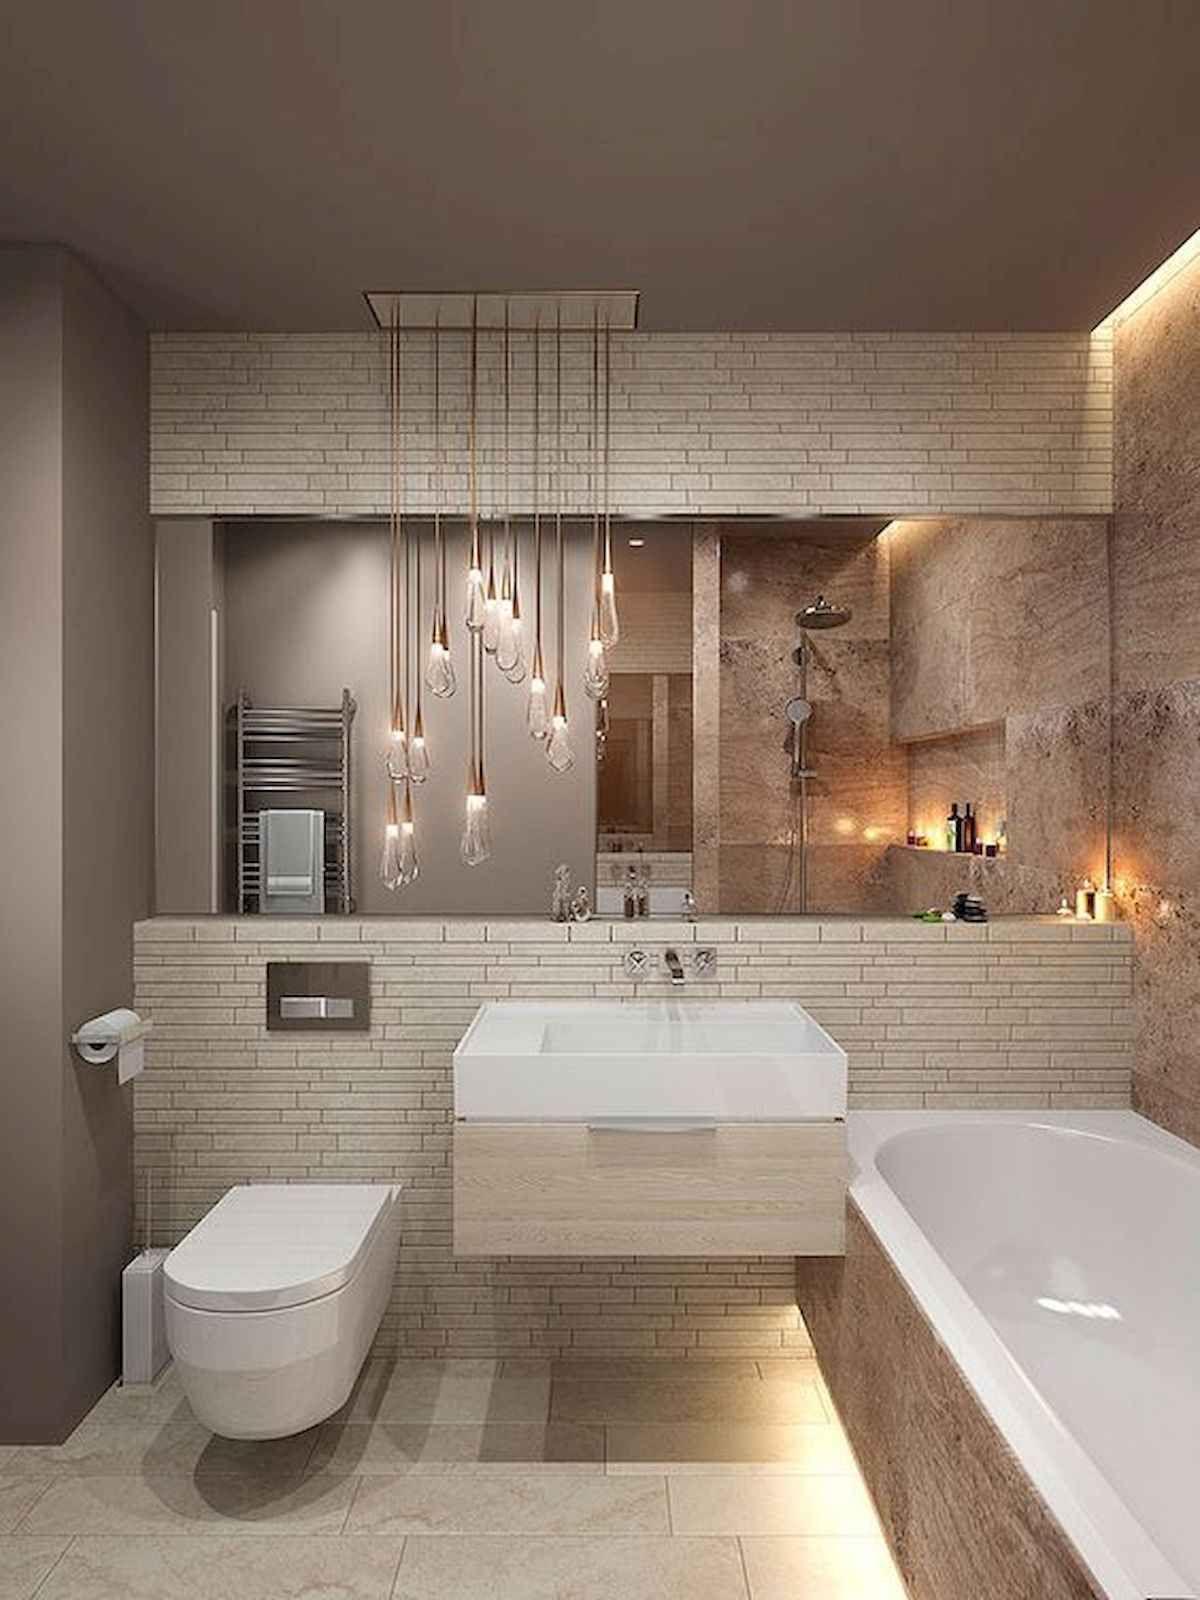 55 fresh small master bathroom remodel ideas and design on amazing small bathroom designs and ideas id=21467